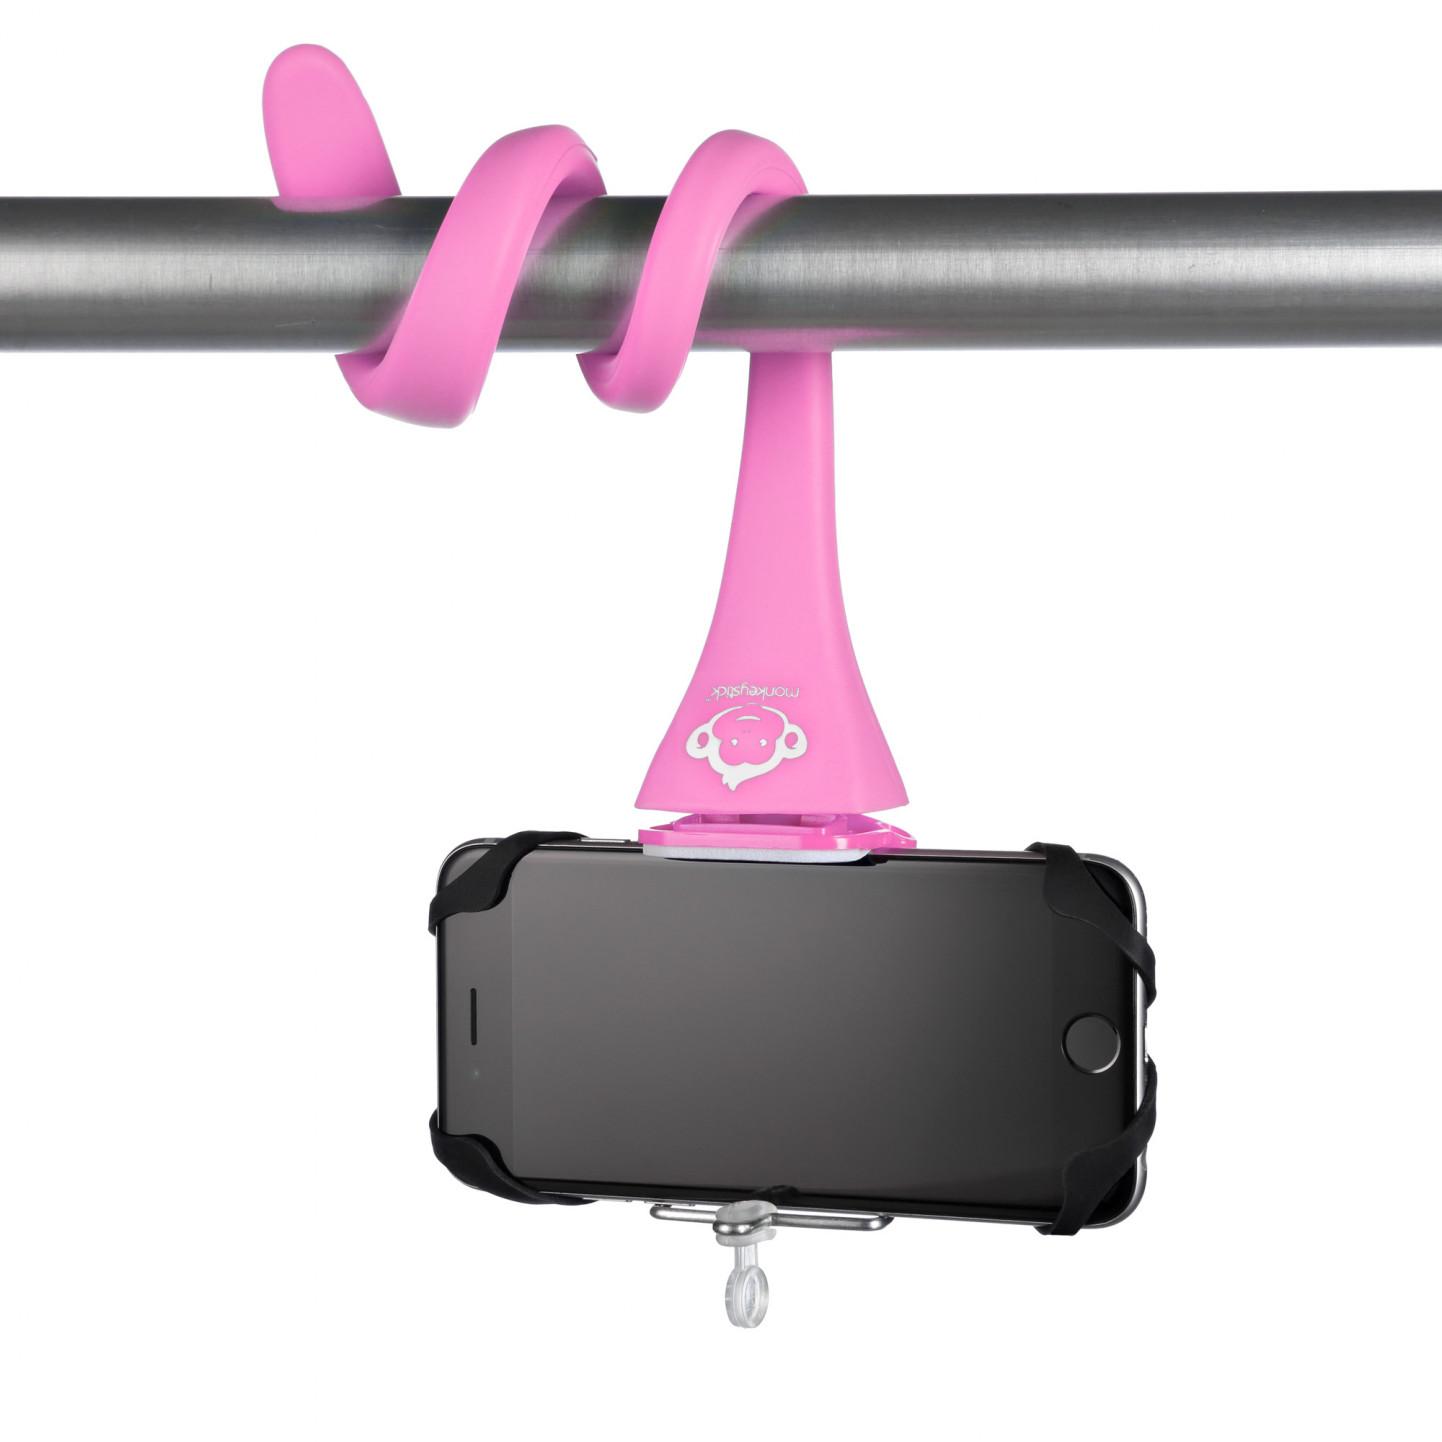 Flexible Phone Mount   Pink